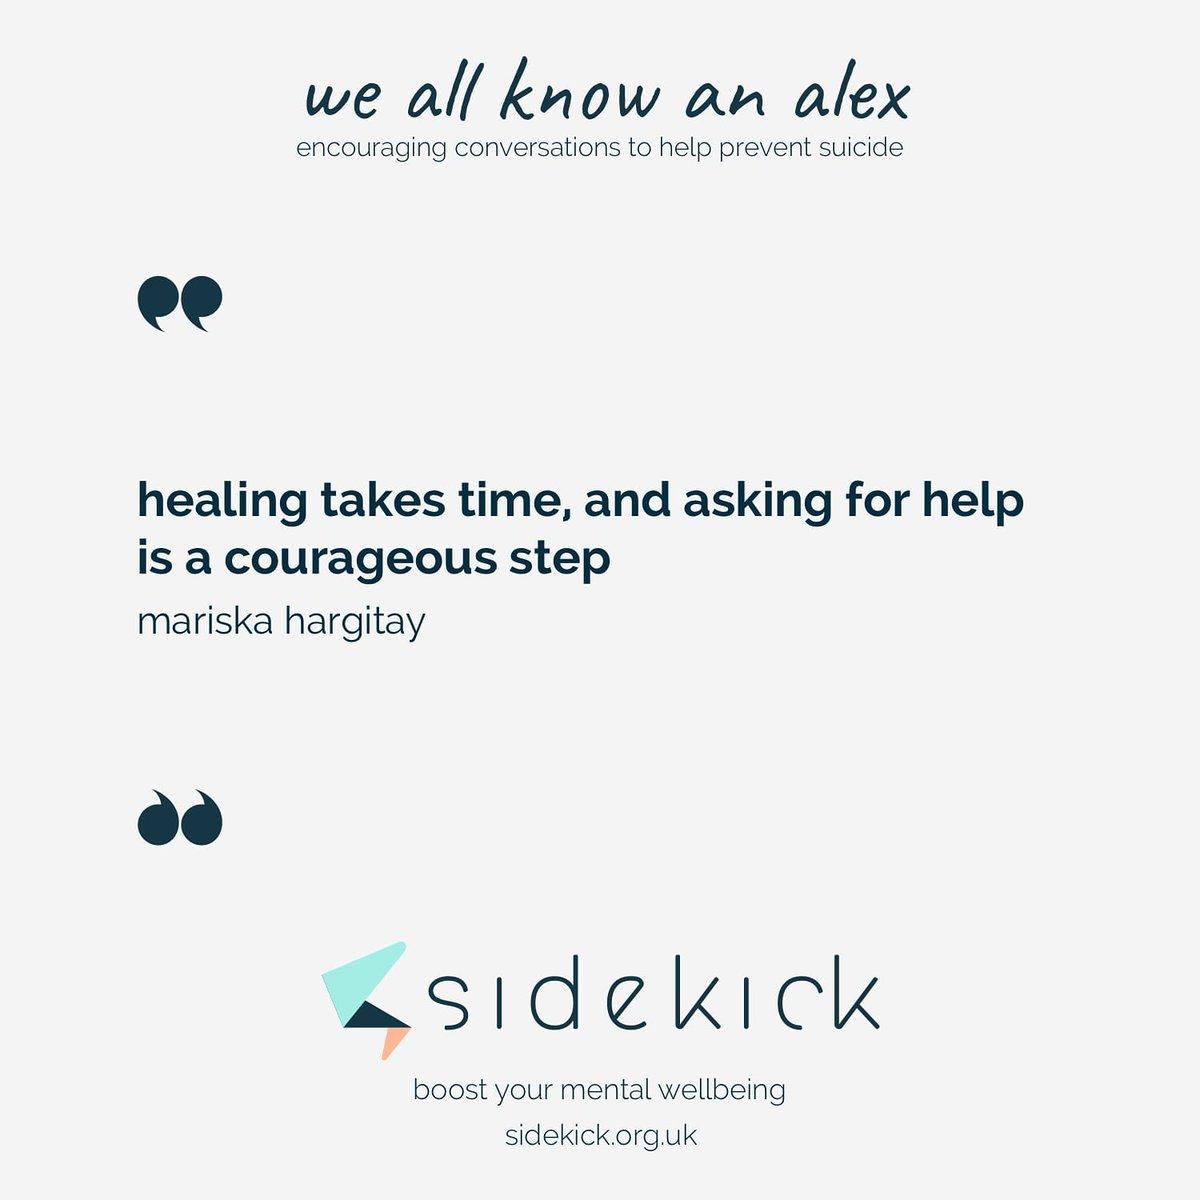 it's never too late to ask for help. healing words by @Mariska  #SuicidePreventionMonth#suicideawareness#depressionawareness#depressionhelp#anxietyawareness#endthestigma#yourenotalone#mentalhealthawareness#WeAllKnowAnAlex #mentalwellbeing #MentalHealthMatters https://t.co/DaTgdhxJsC